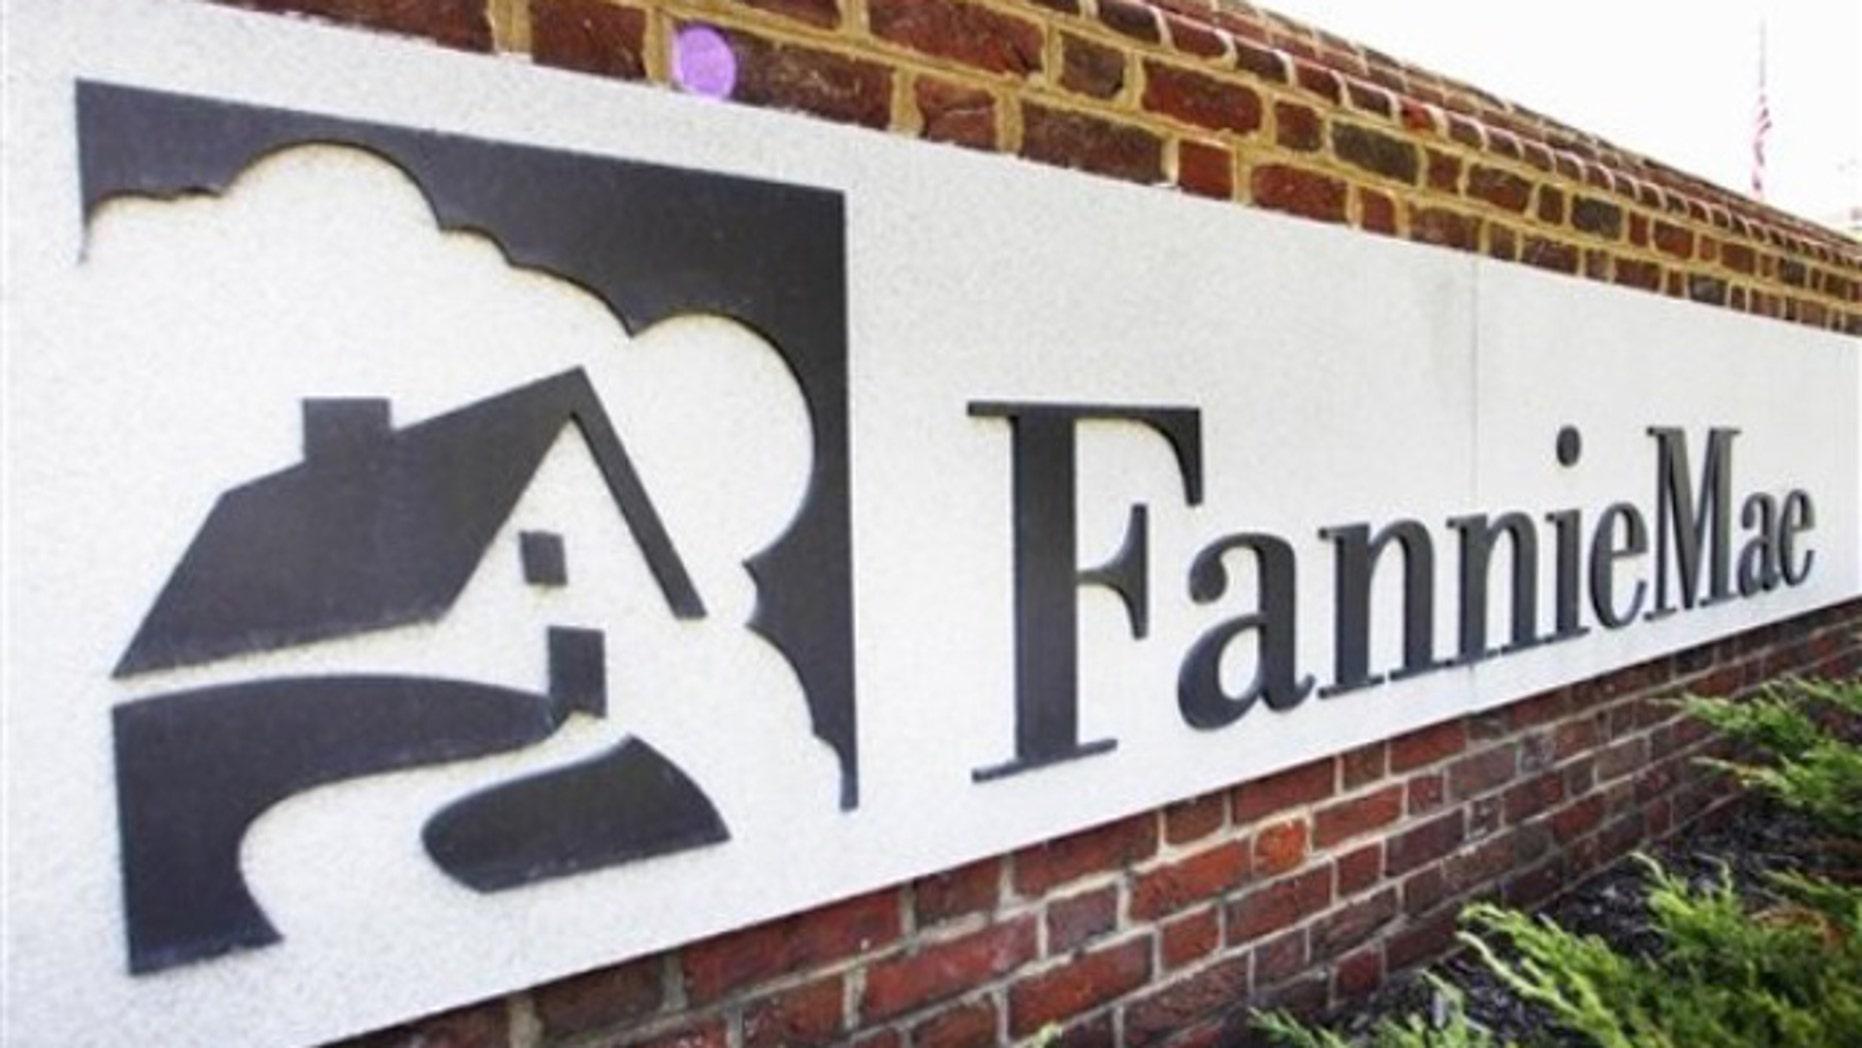 Aug. 8, 2011: The Fannie Mae headquarters is seen in Washington.